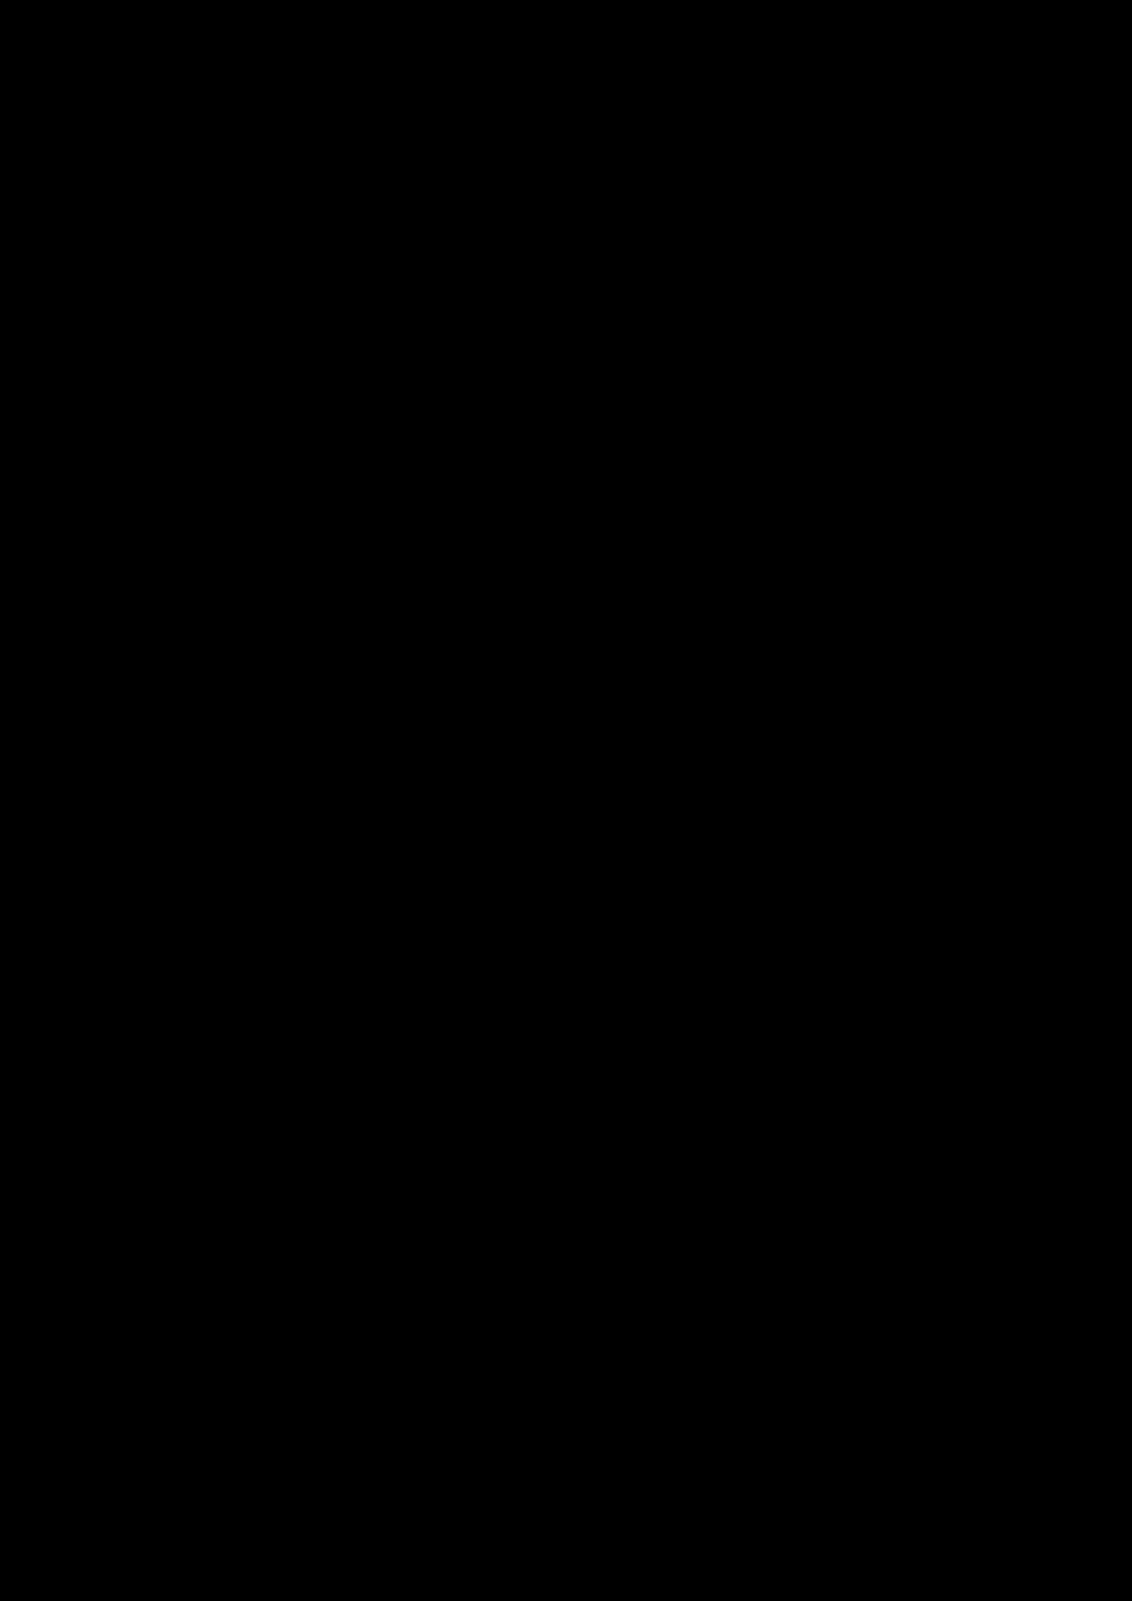 Ispoved Pervogo Boga slide, Image 72